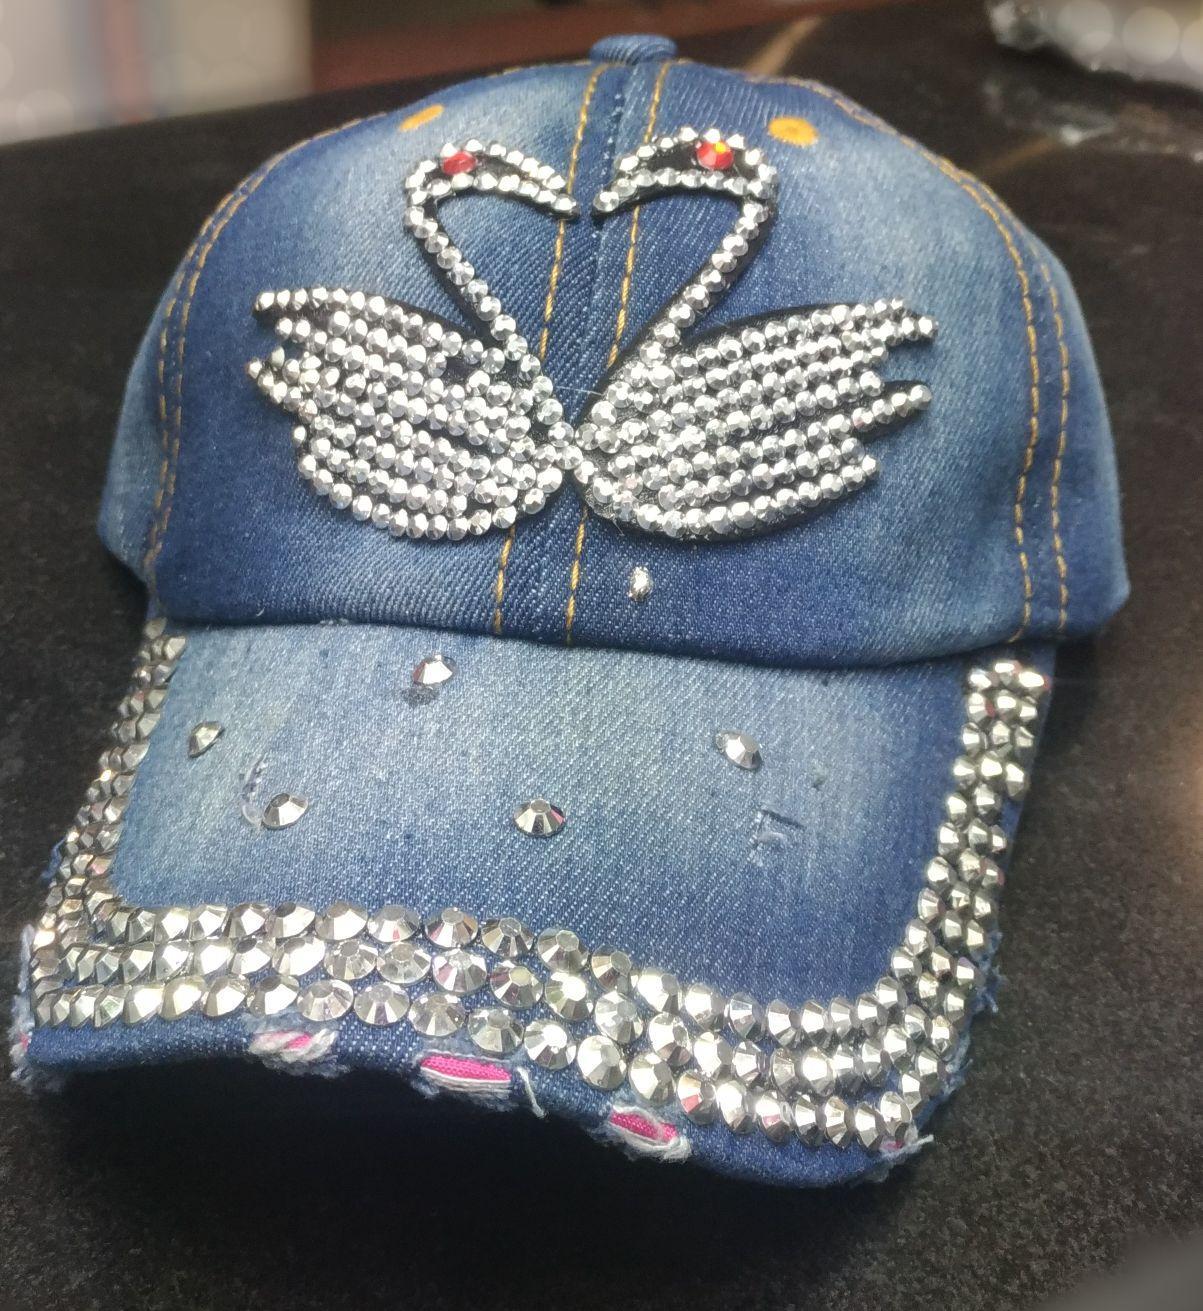 Princess Wardrobe - Topi Fashion Korea [ SWAN ] / Topi Blink Bling / Shiny Hats / Topi Import